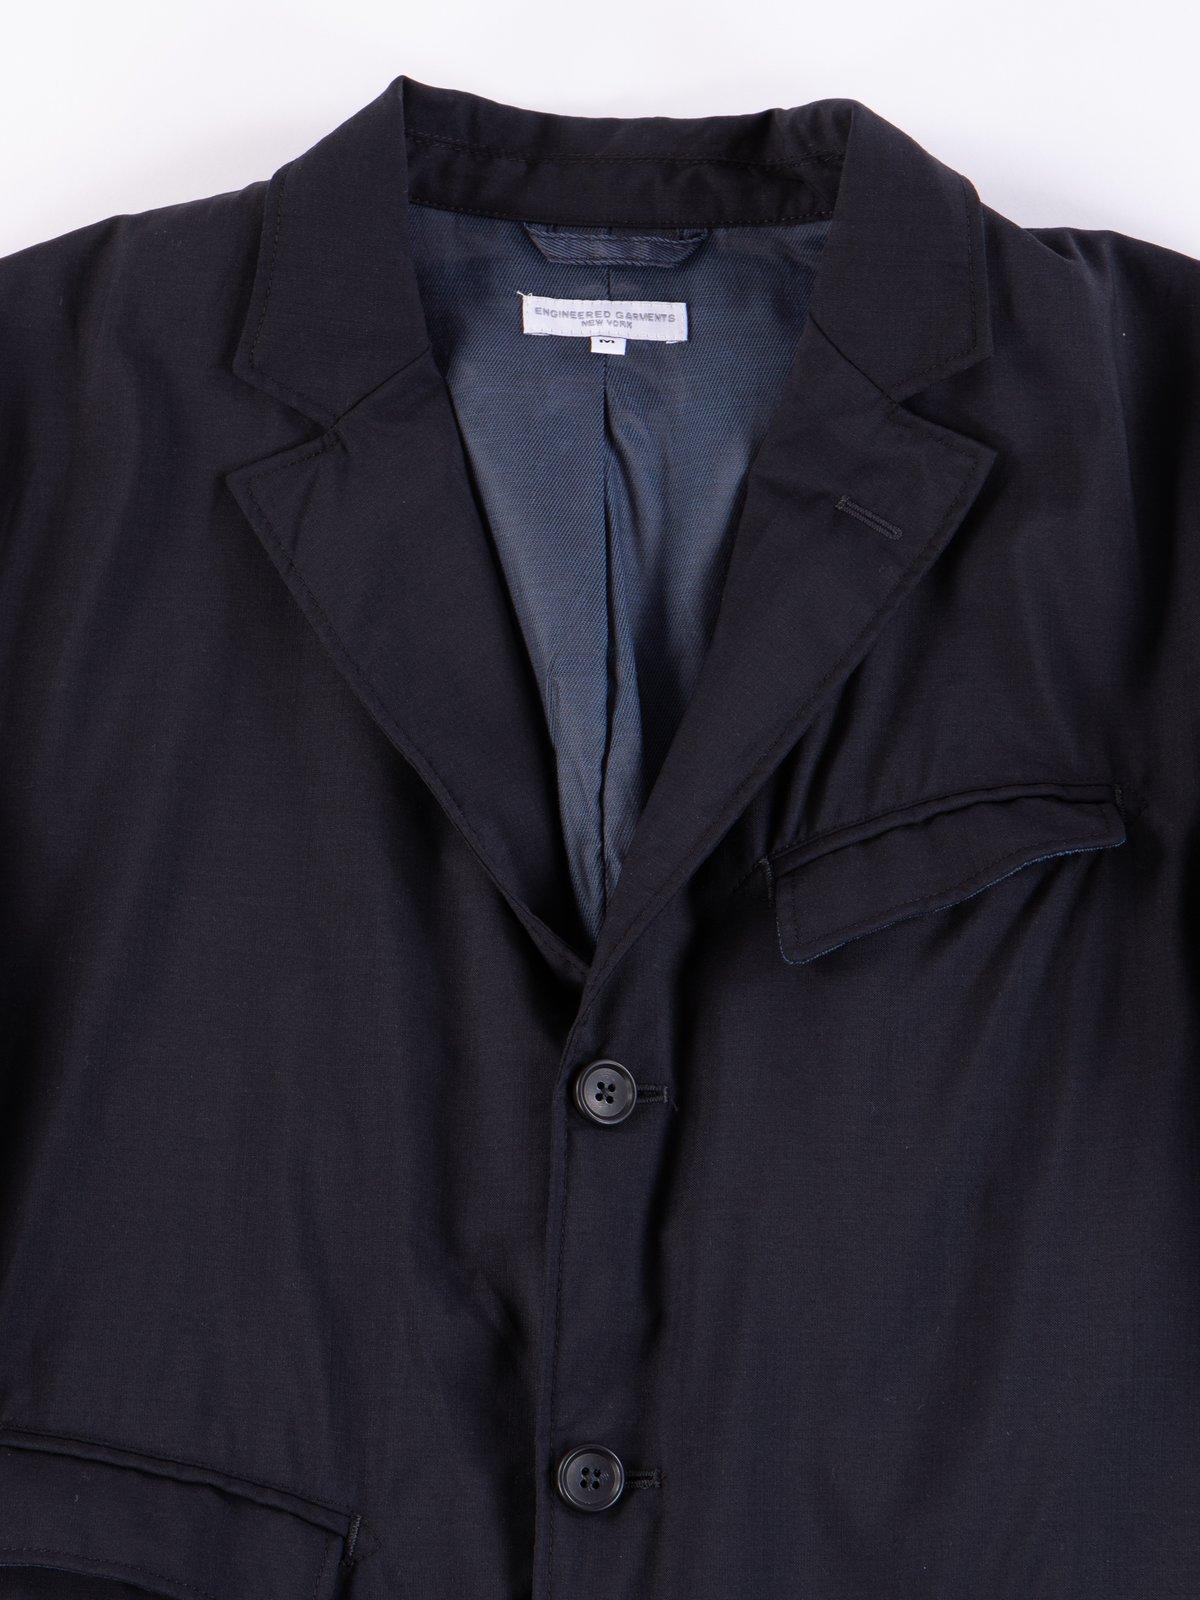 Dark Navy Tropical Wool Andover Jacket - Image 3